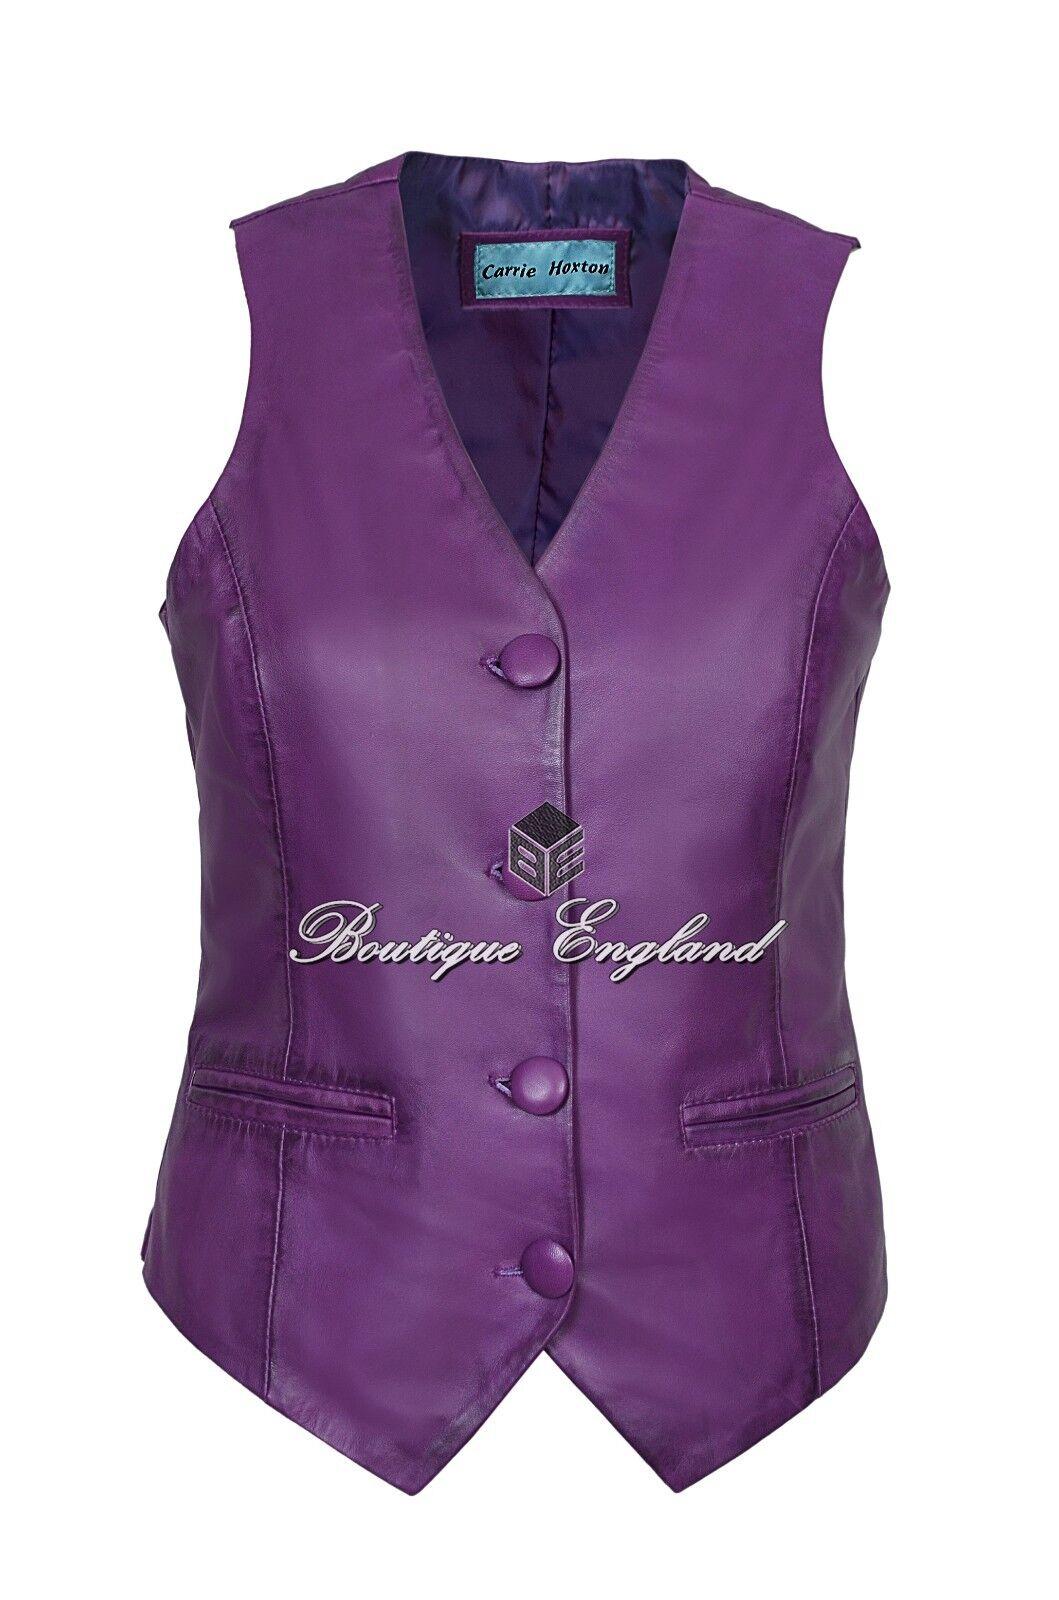 Ladies Purple Waistcoat Cool Casual Fashion Vest Soft Lambskin Leather 5701